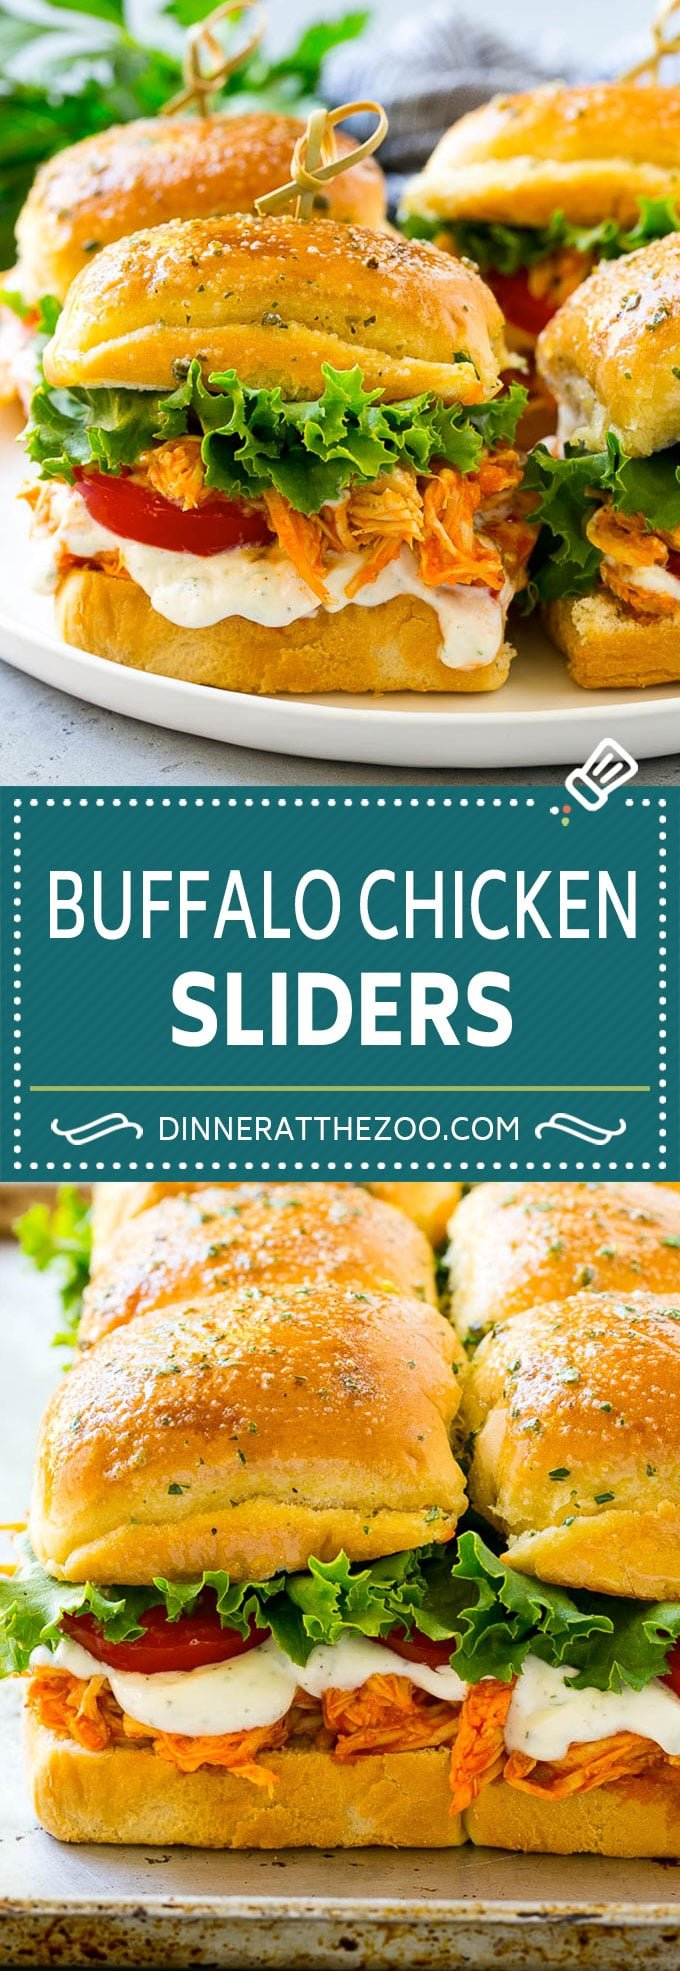 Buffalo Chicken Sliders Recipe   Buffalo Chicken Sandwich   Buffalo Chicken #buffalochicken #sliders #sandwich #appetizer #snack #dinneratthezoo